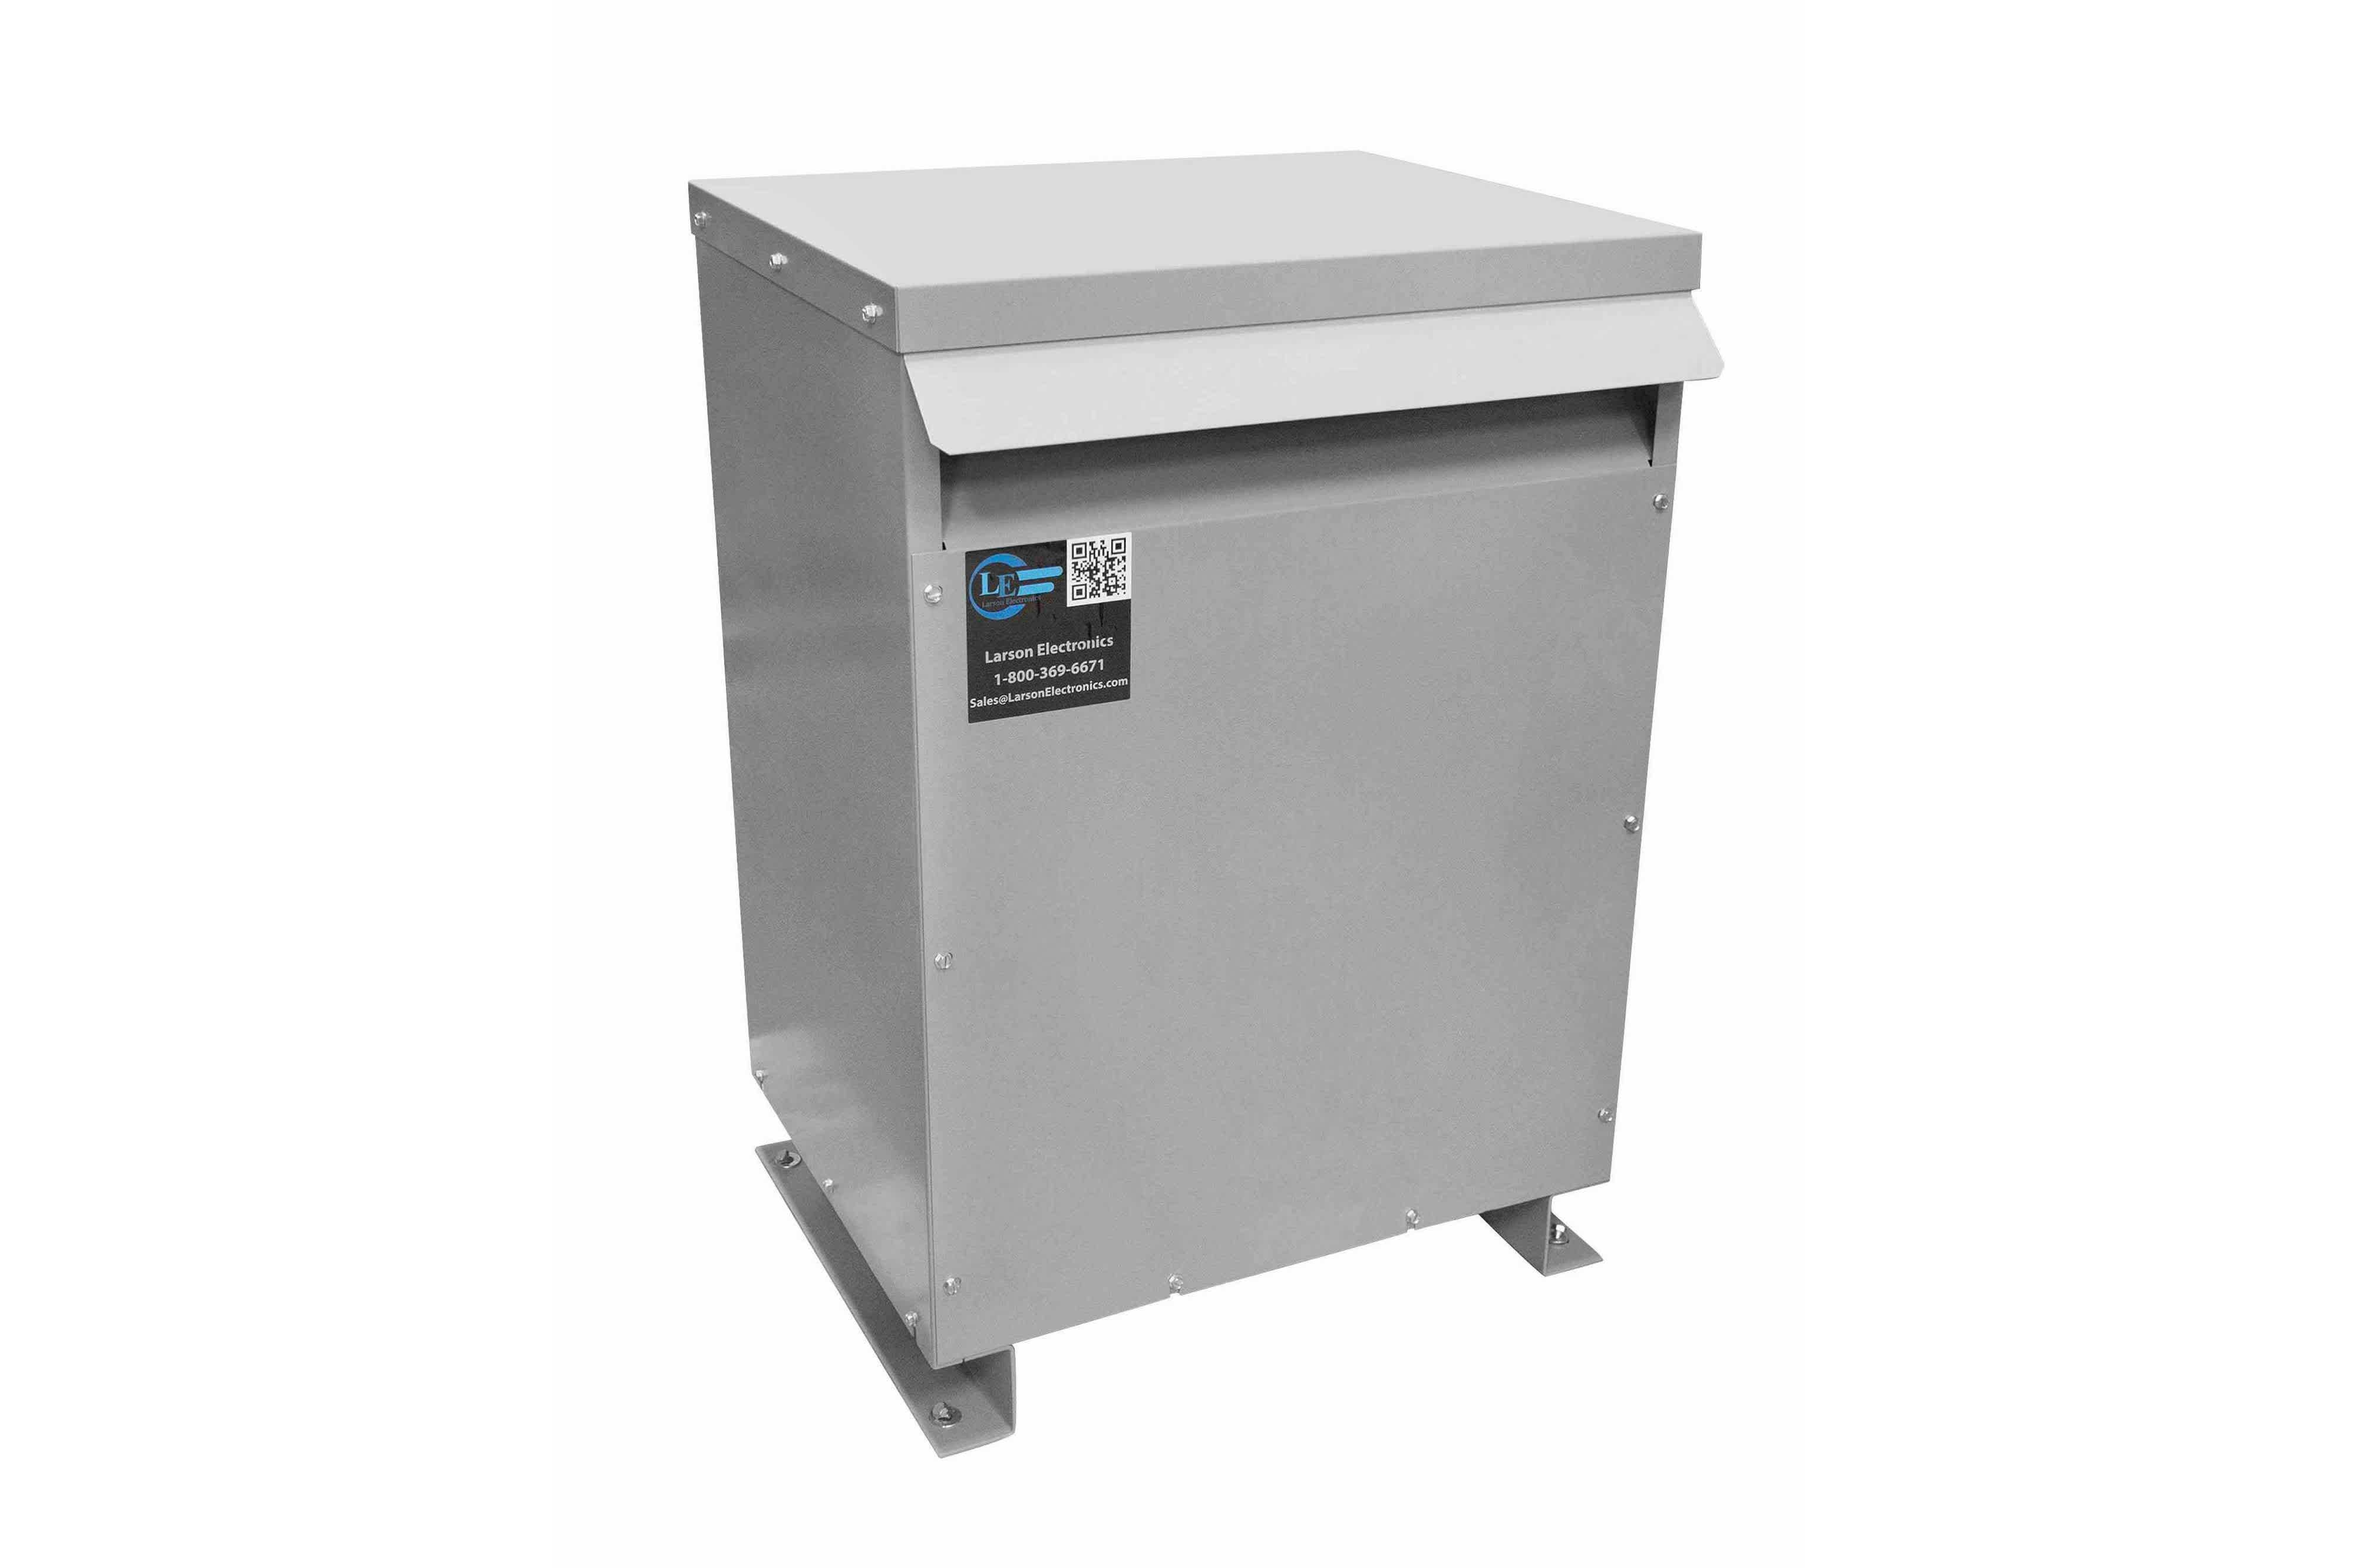 100 kVA 3PH Isolation Transformer, 575V Wye Primary, 380Y/220 Wye-N Secondary, N3R, Ventilated, 60 Hz